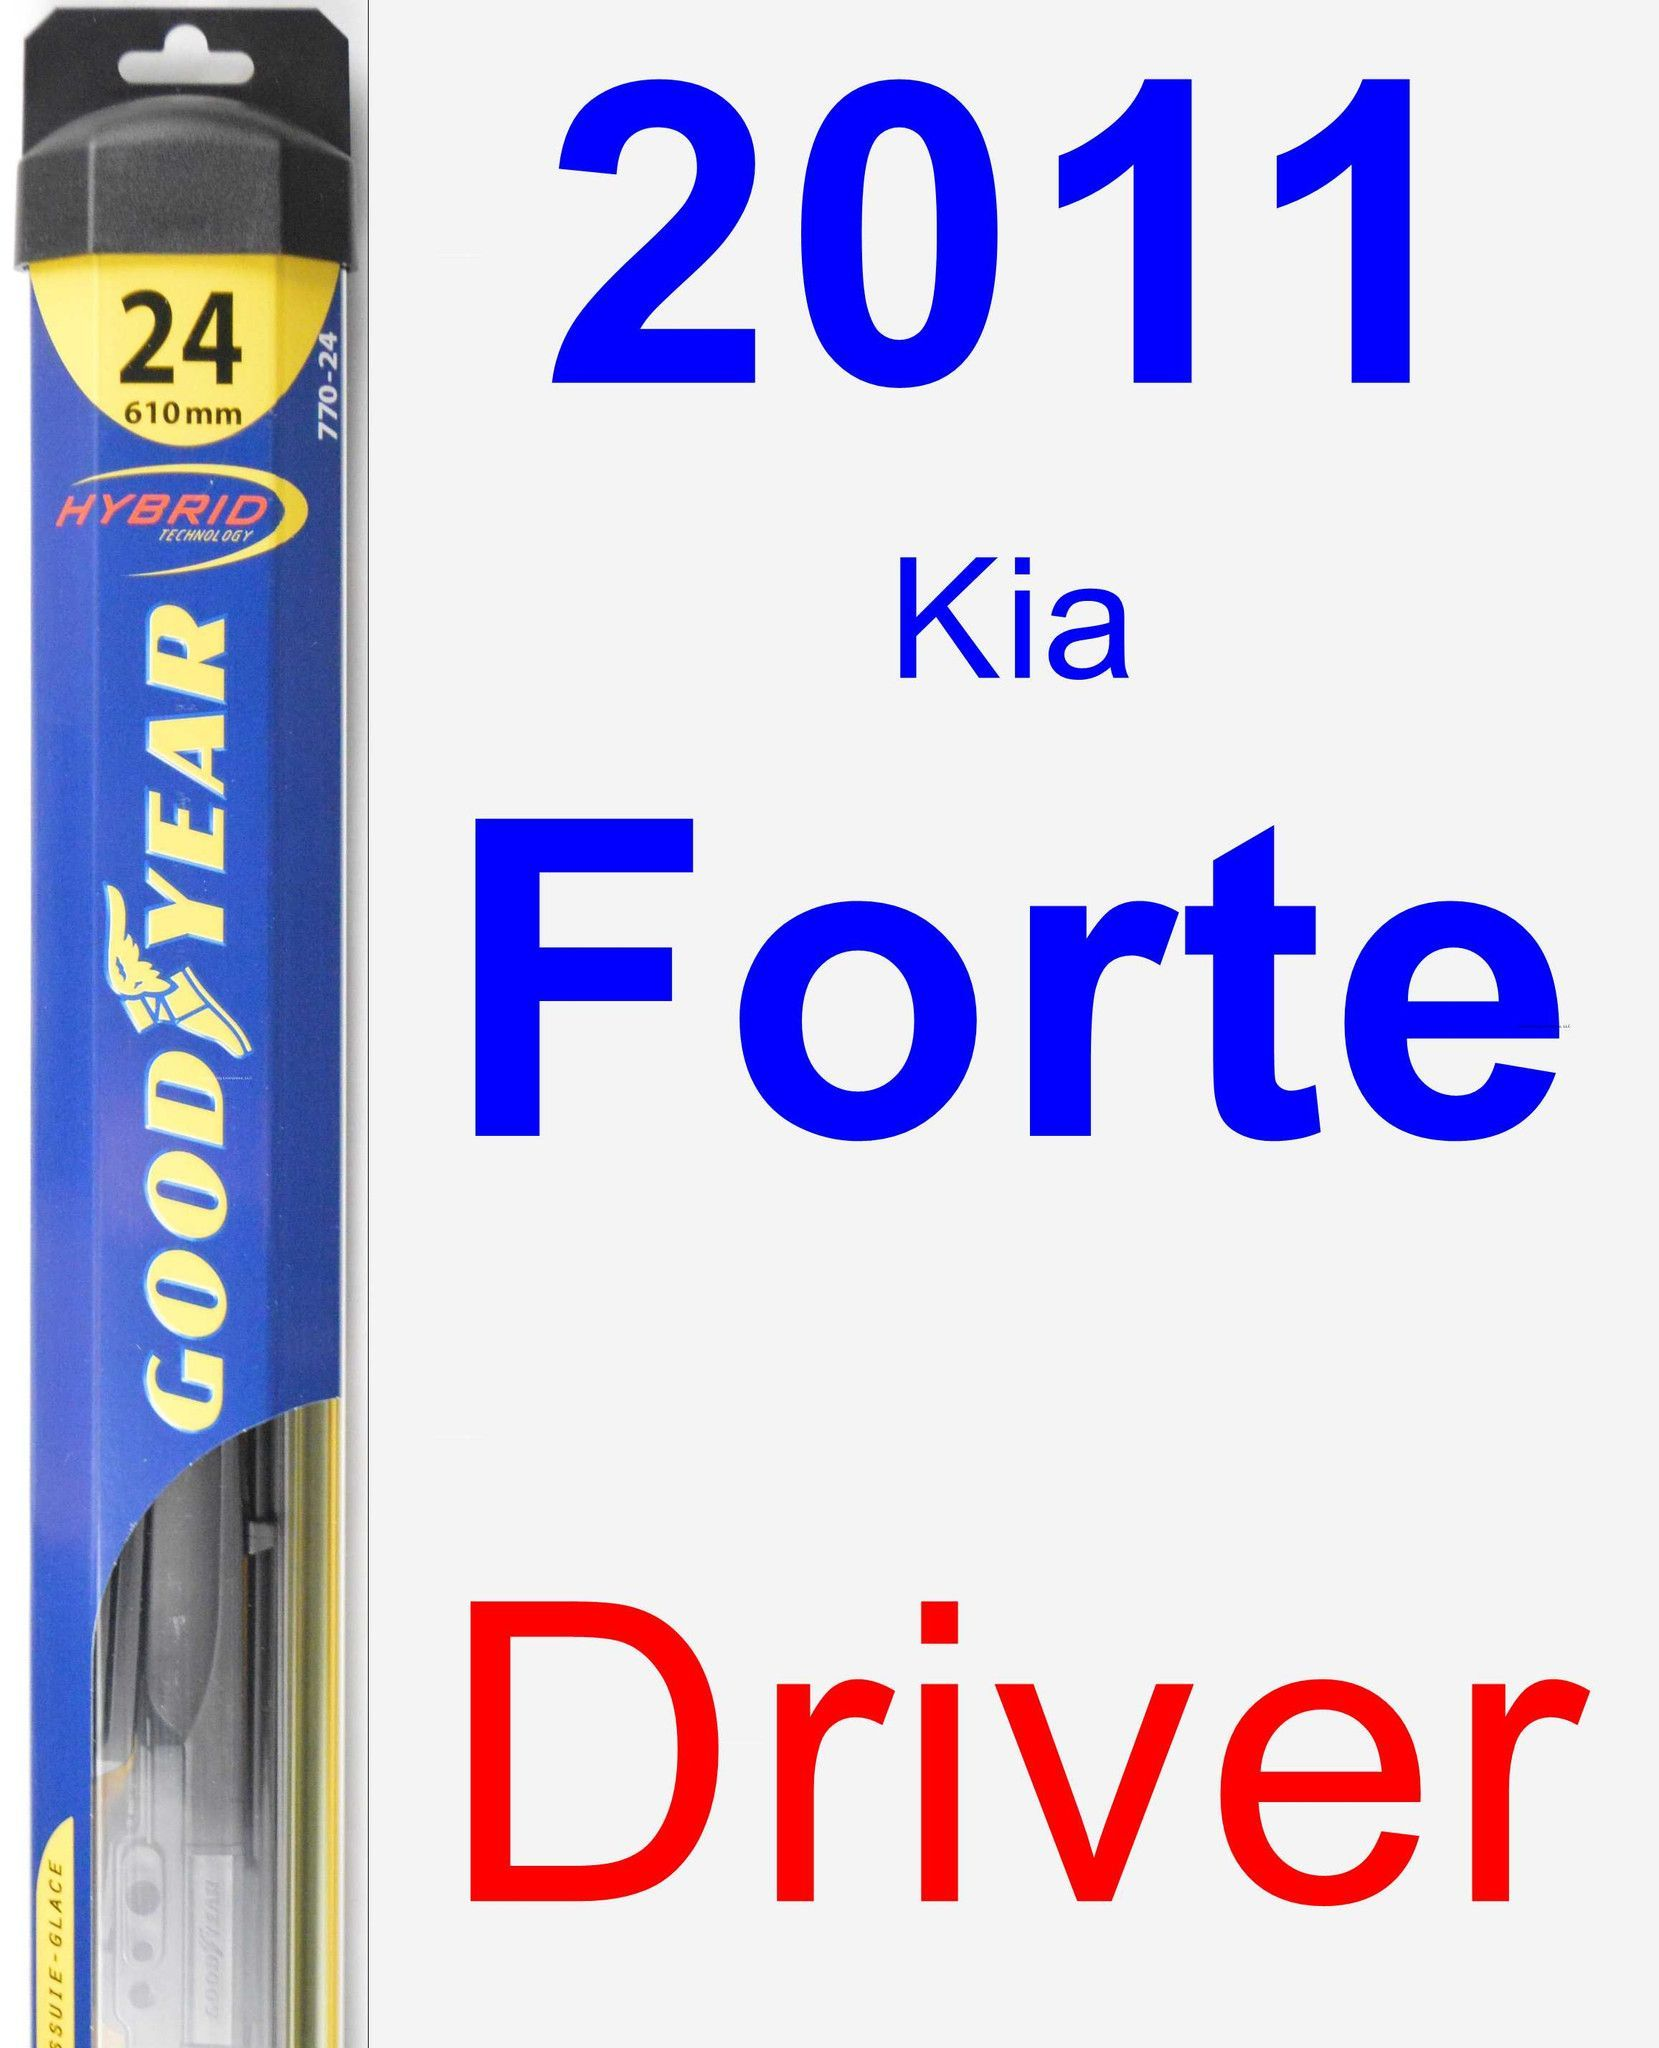 Driver Wiper Blade for 2011 Kia Forte - Hybrid